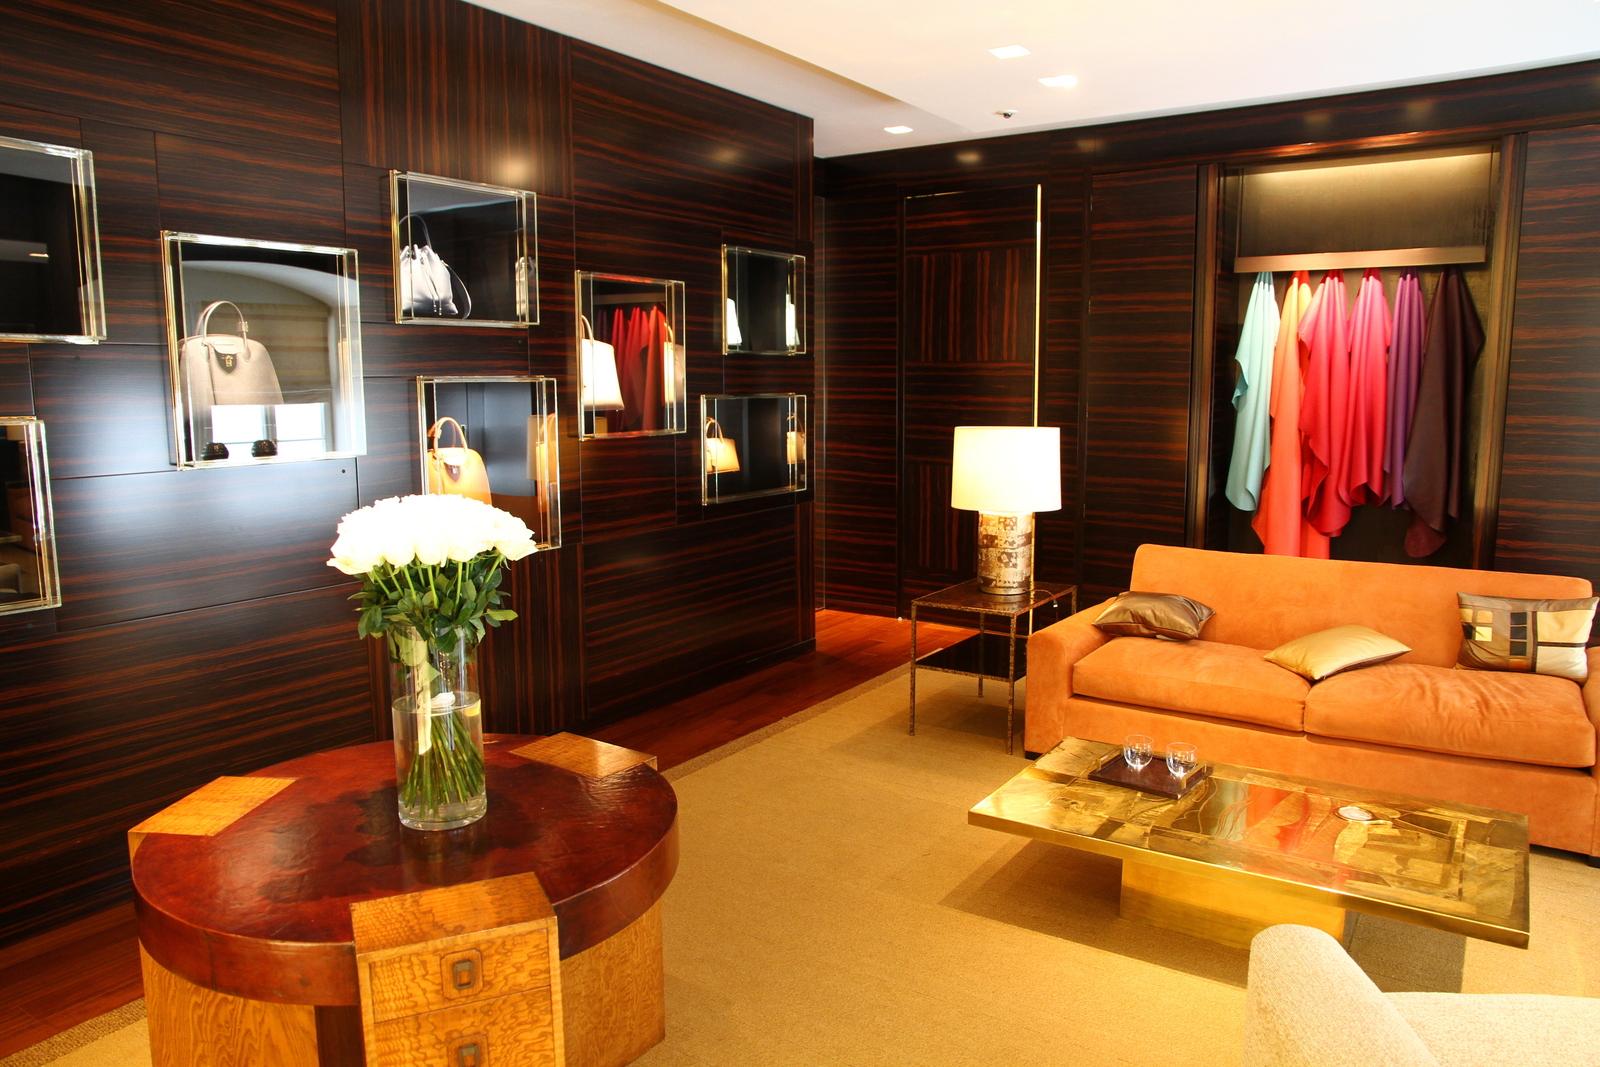 File:Louis Vuitton VIP room in Vienna.JPG - Wikimedia Commons